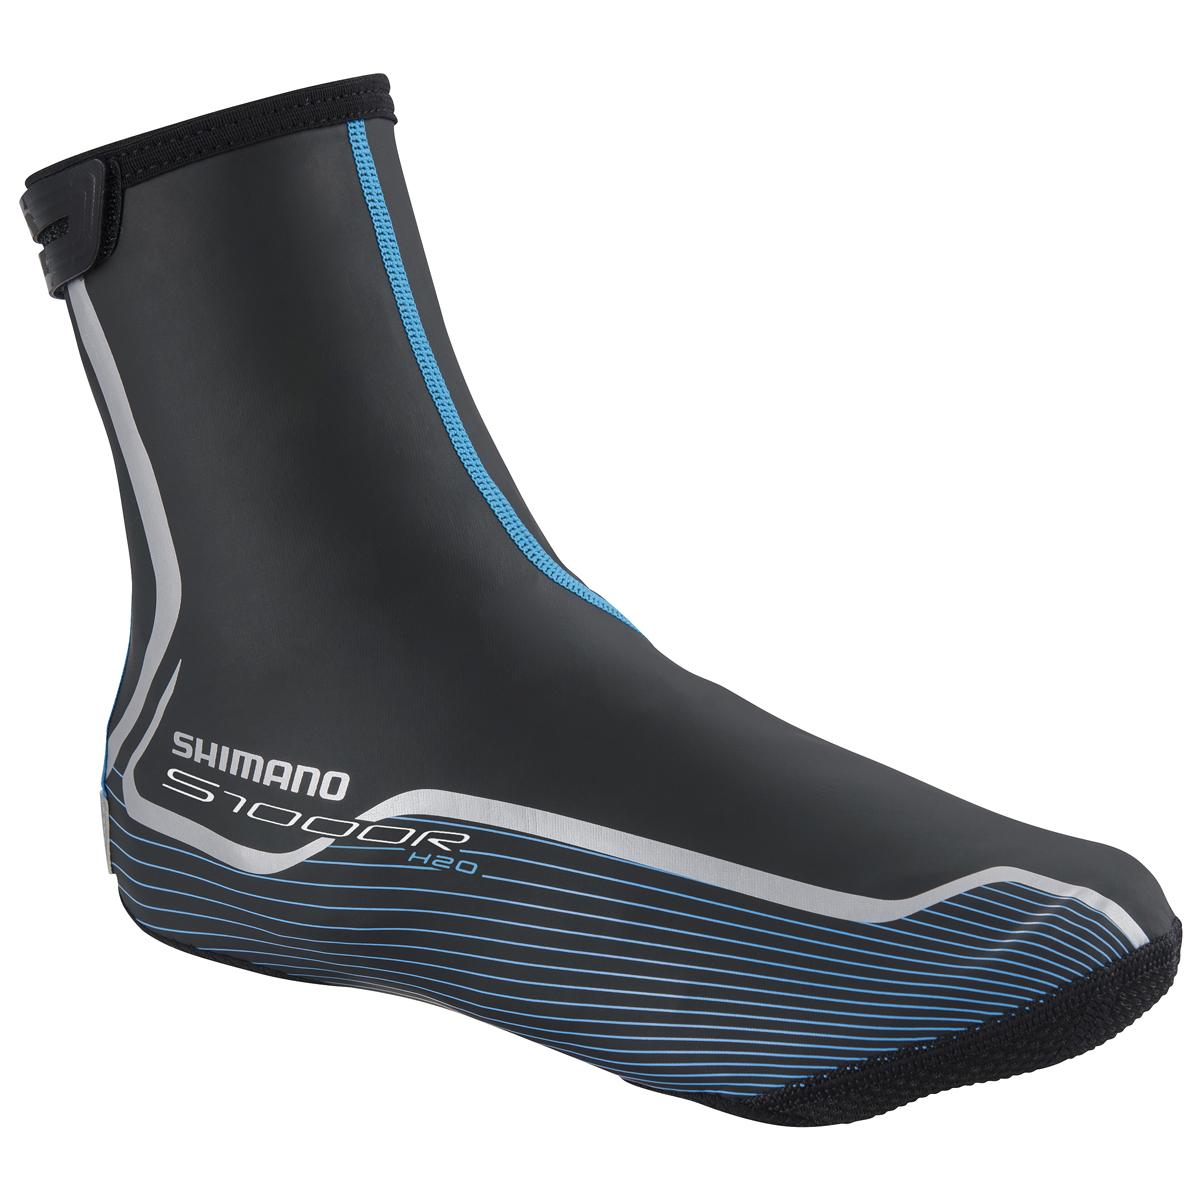 Shimano S1000R H20 Skoovertræk | shoecovers_clothes